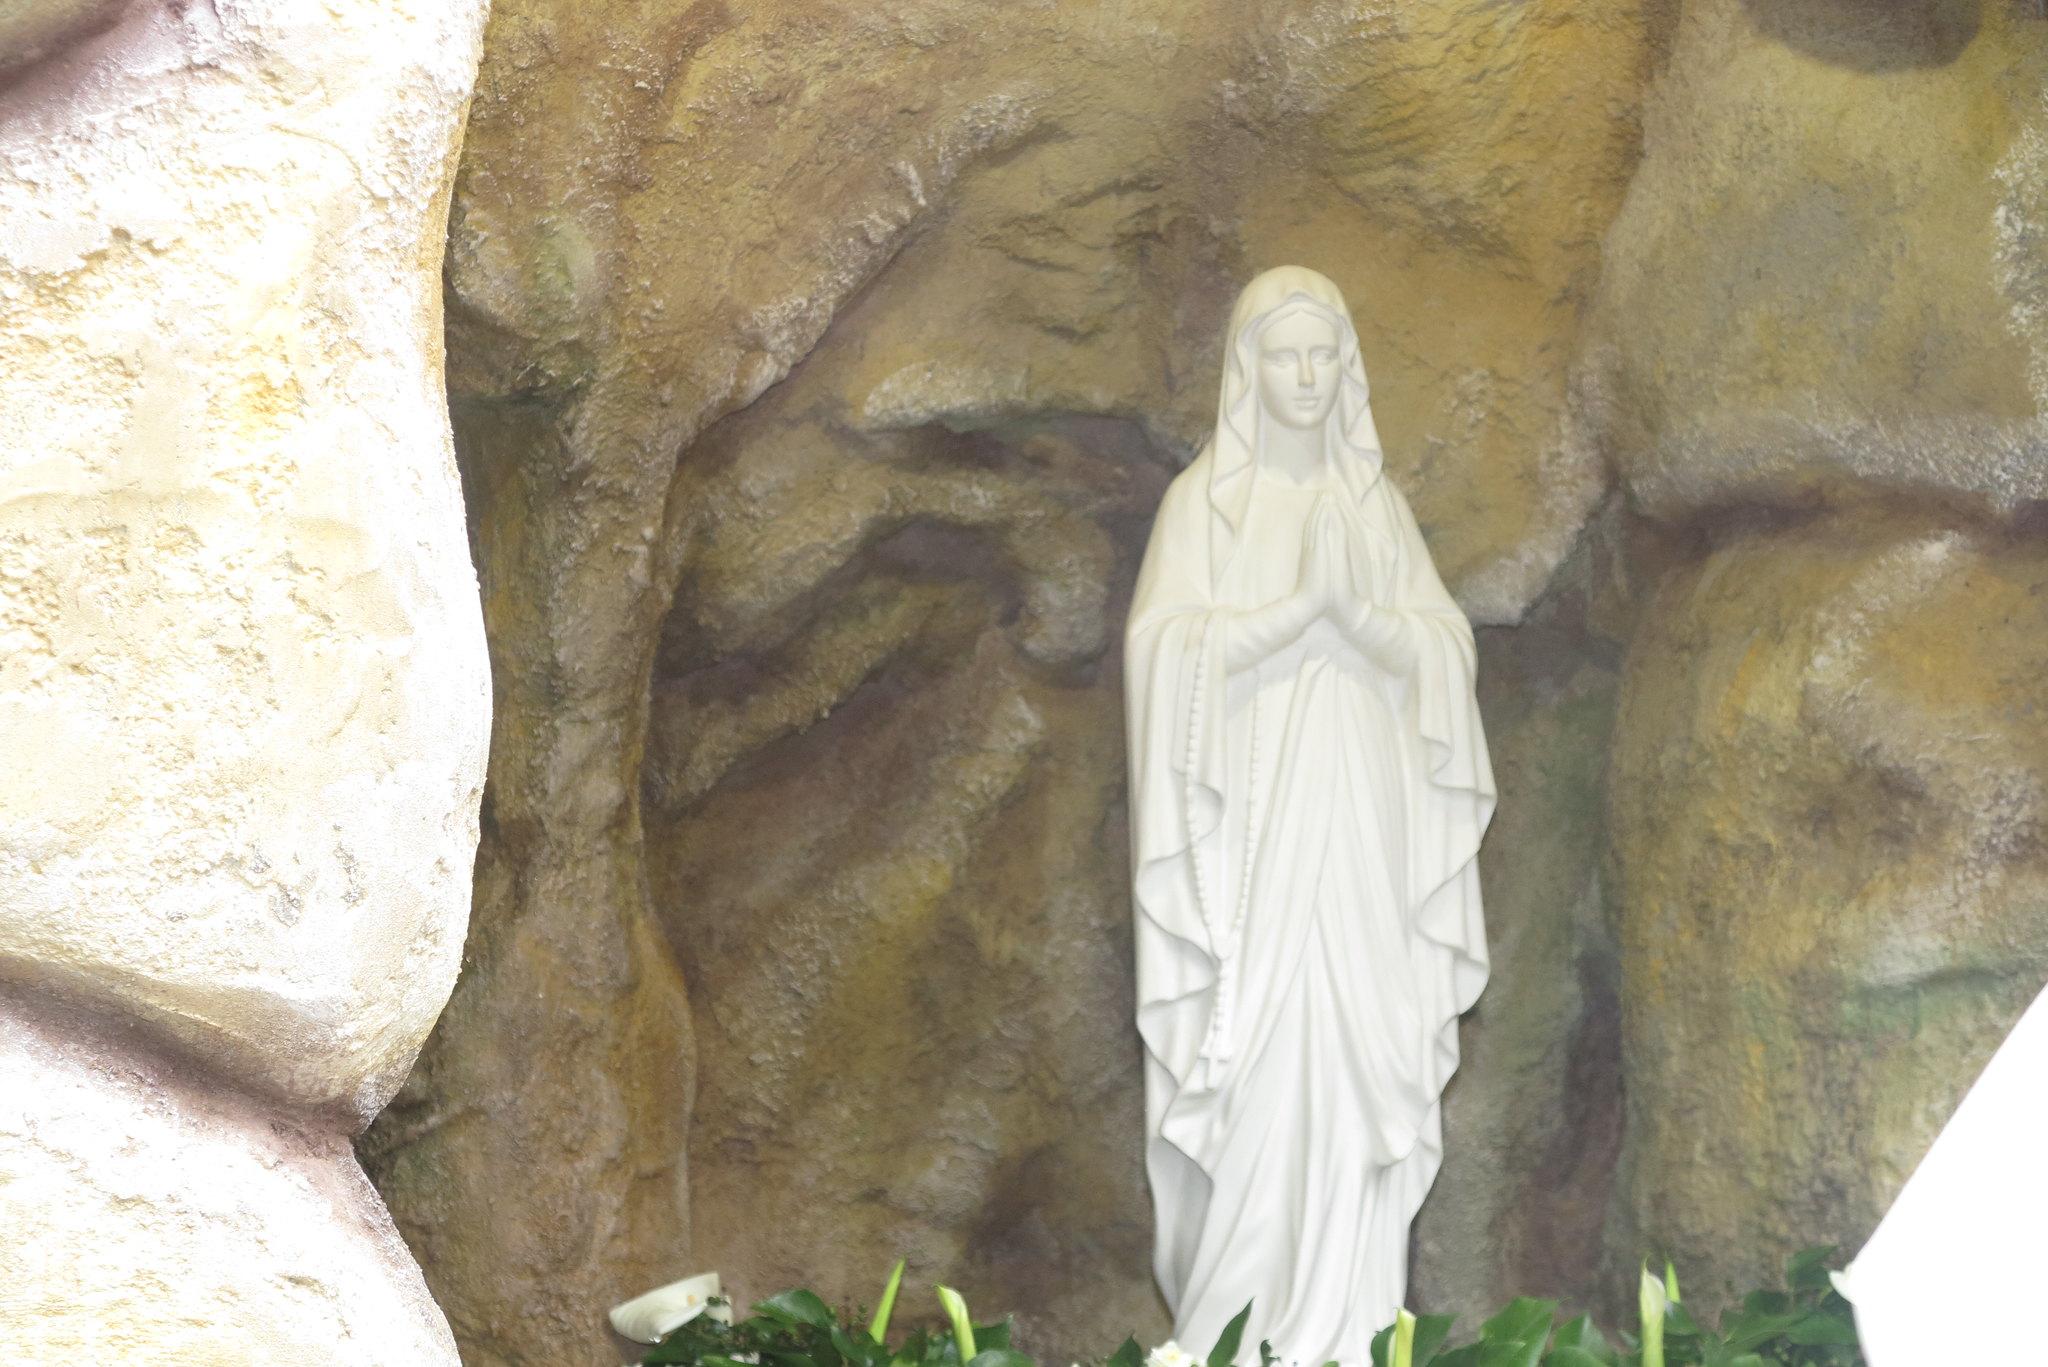 (2016-02-13) - Inauguración Virgen de Lourdes, La Molineta - Archivo La Molineta 2 (57)